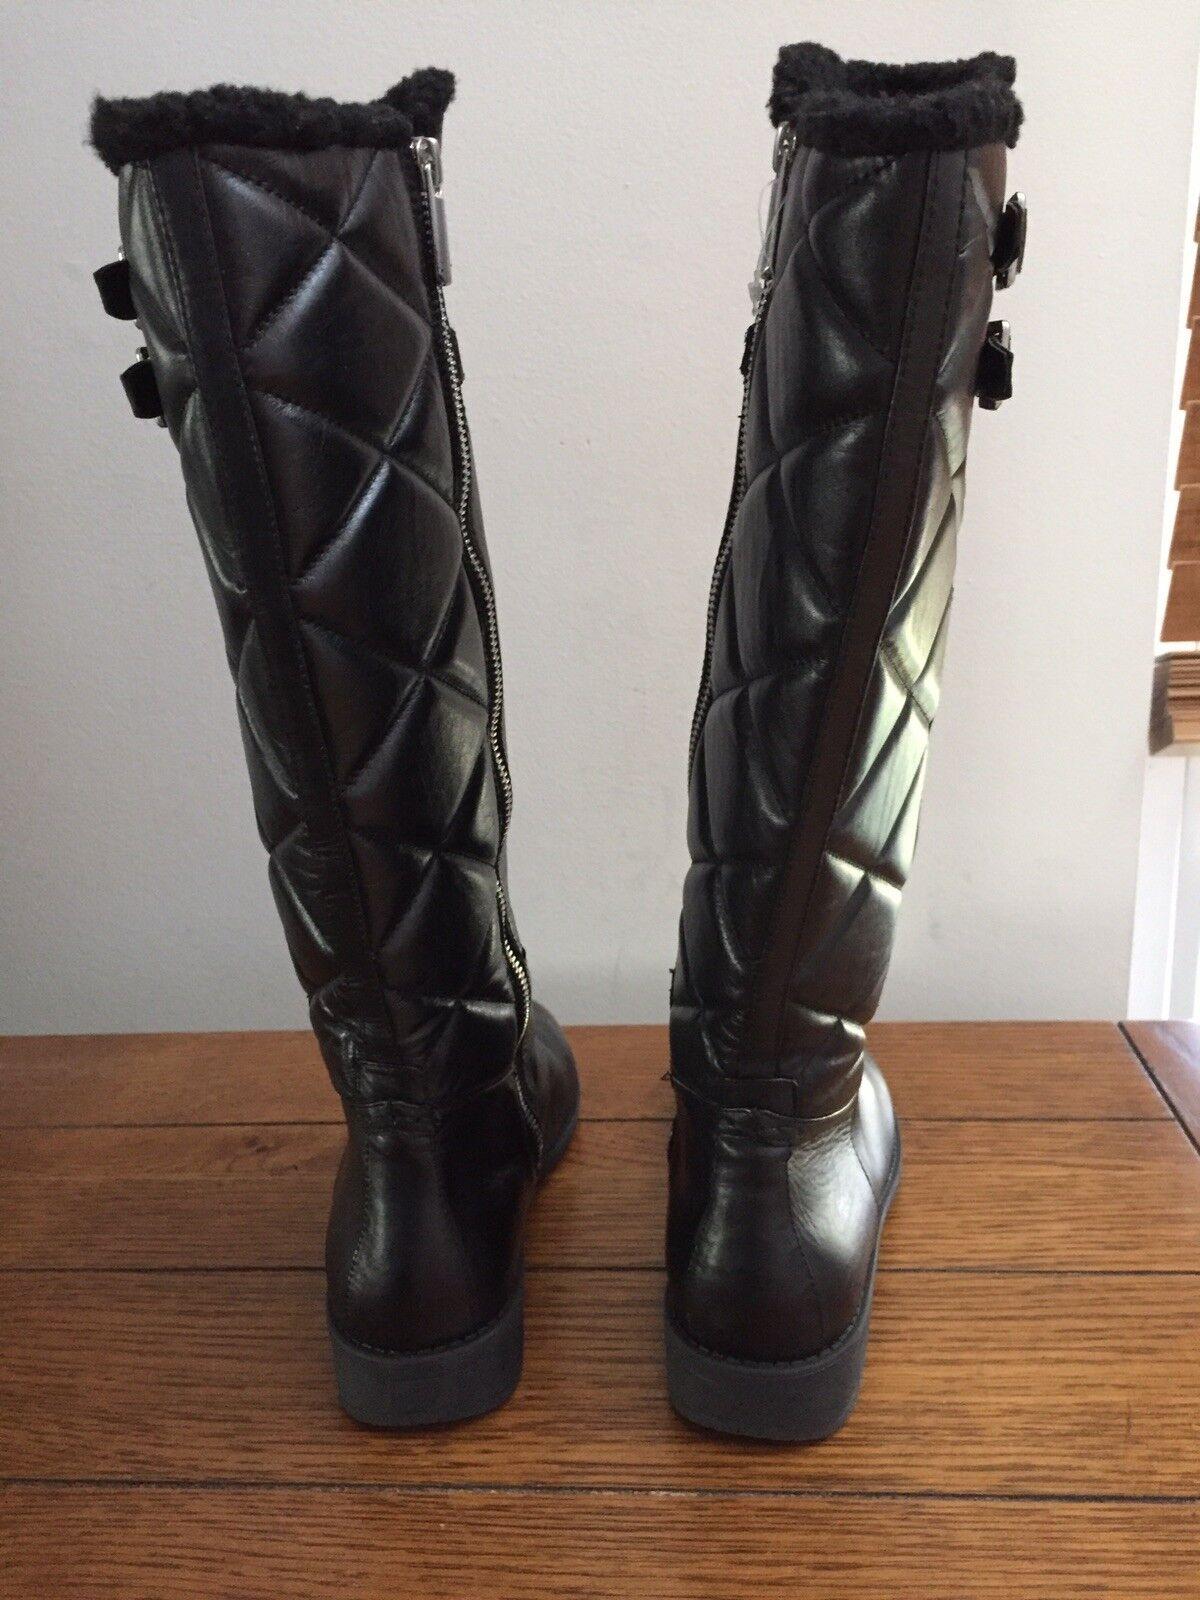 Taryn pink Arnie Size 9 Black Leather Knee High High High Waterproof Rain Boots fed493